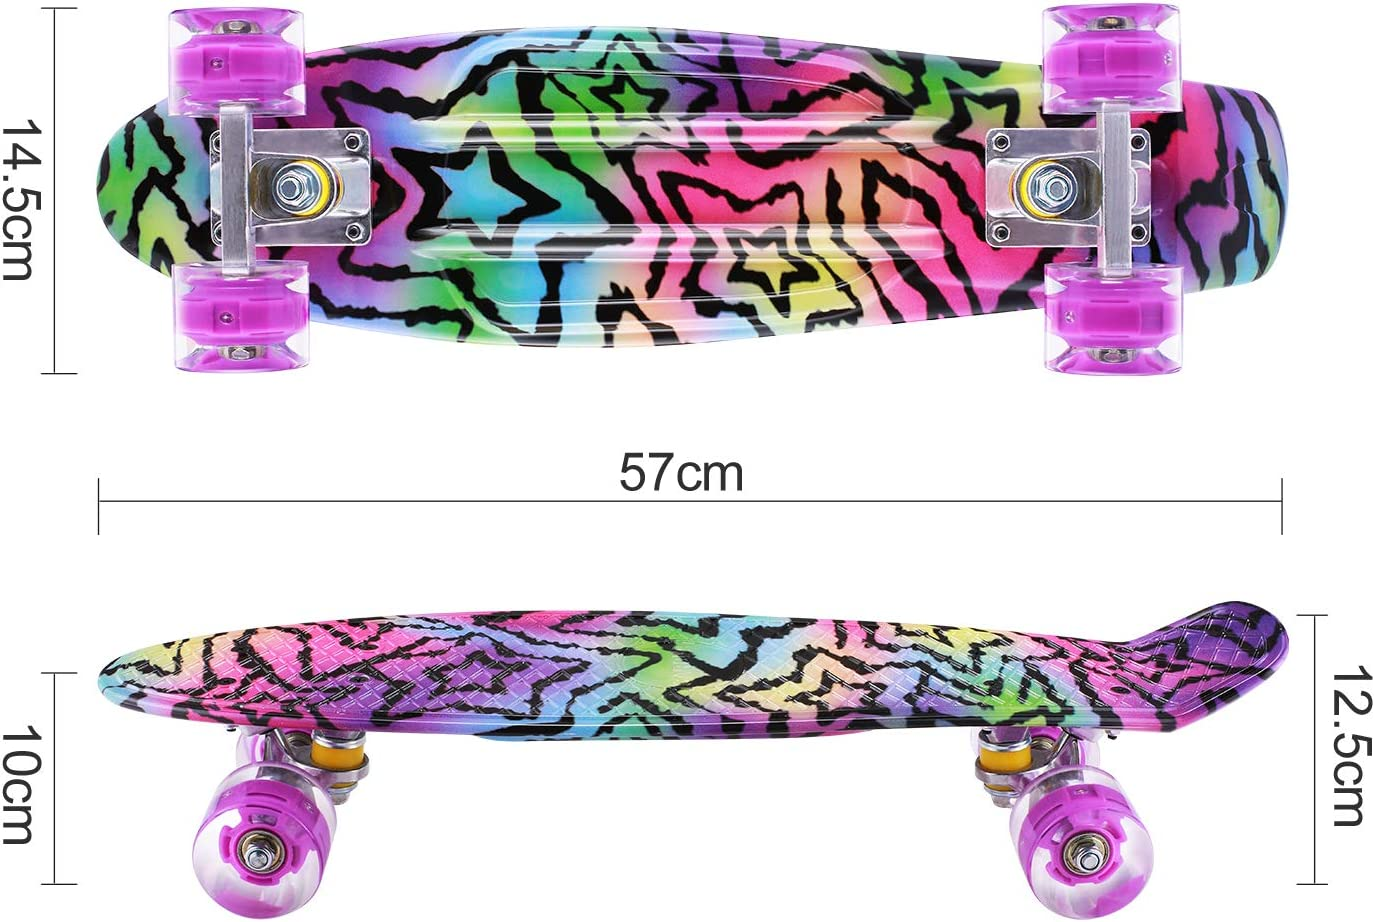 komplette Mini Skateboards 22 Zoll Cruiser mit LED Light Up Wheels f/ür Anf/änger Boys Teens CAROMA Kids Skateboards